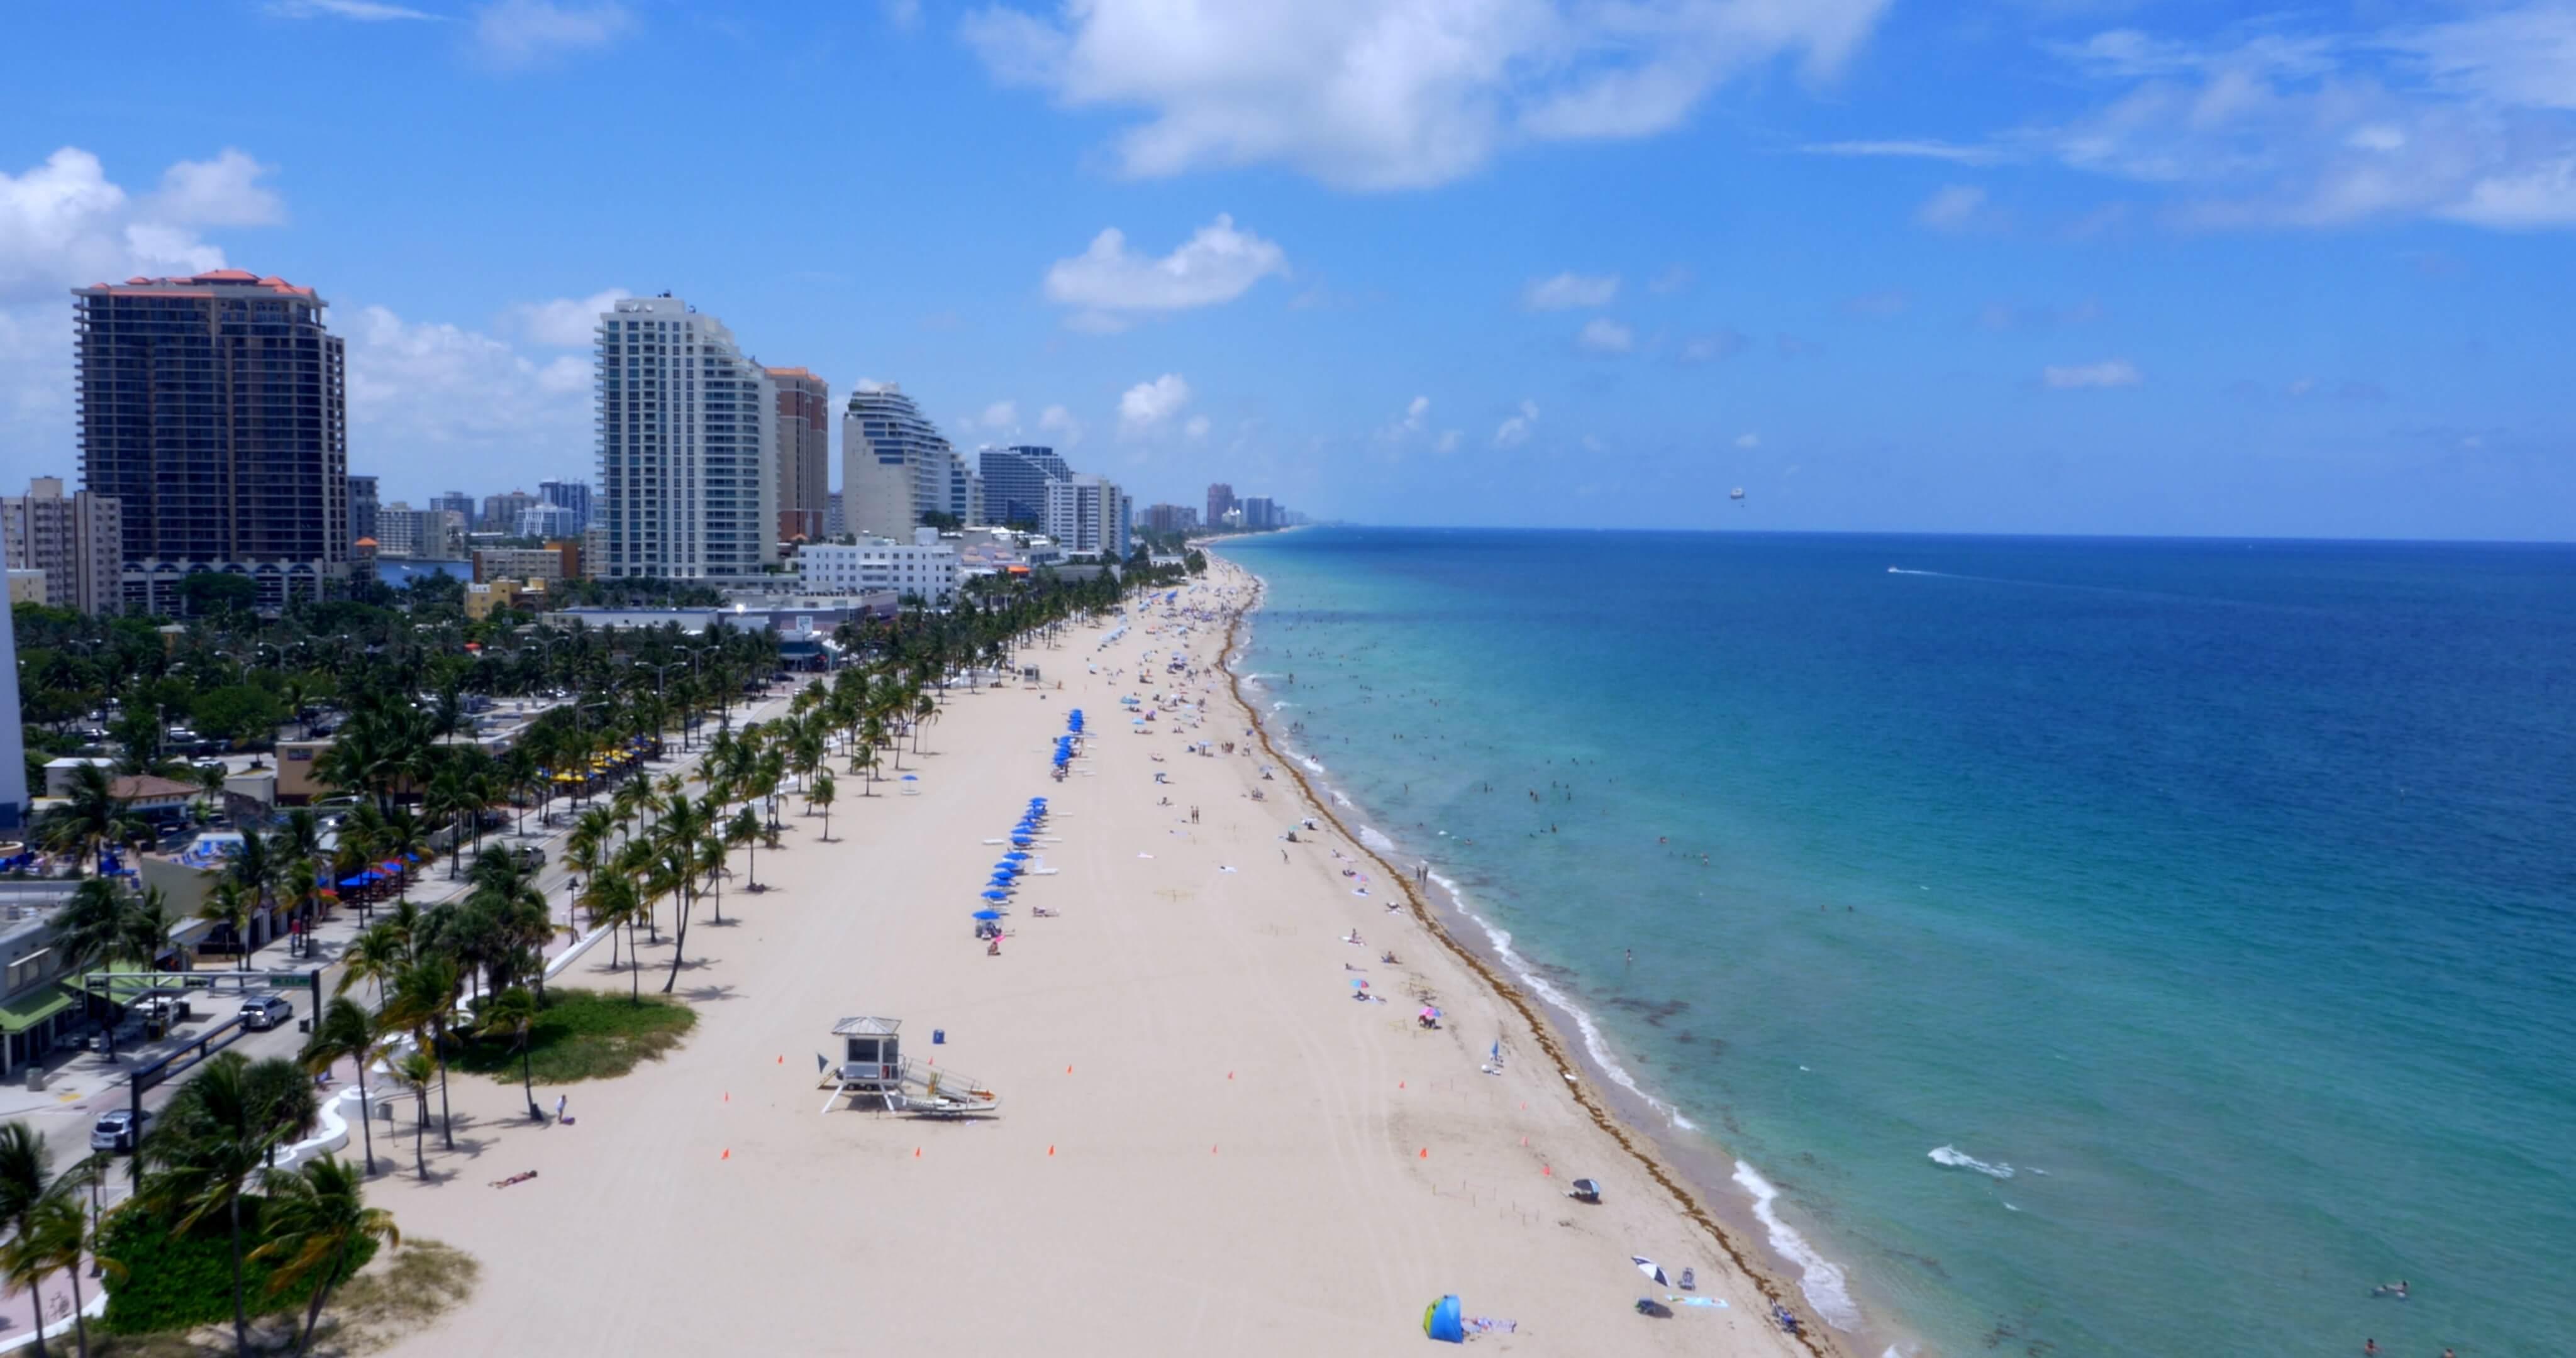 Pontos turísticos em Fort Lauderdale: Las Olas Beach